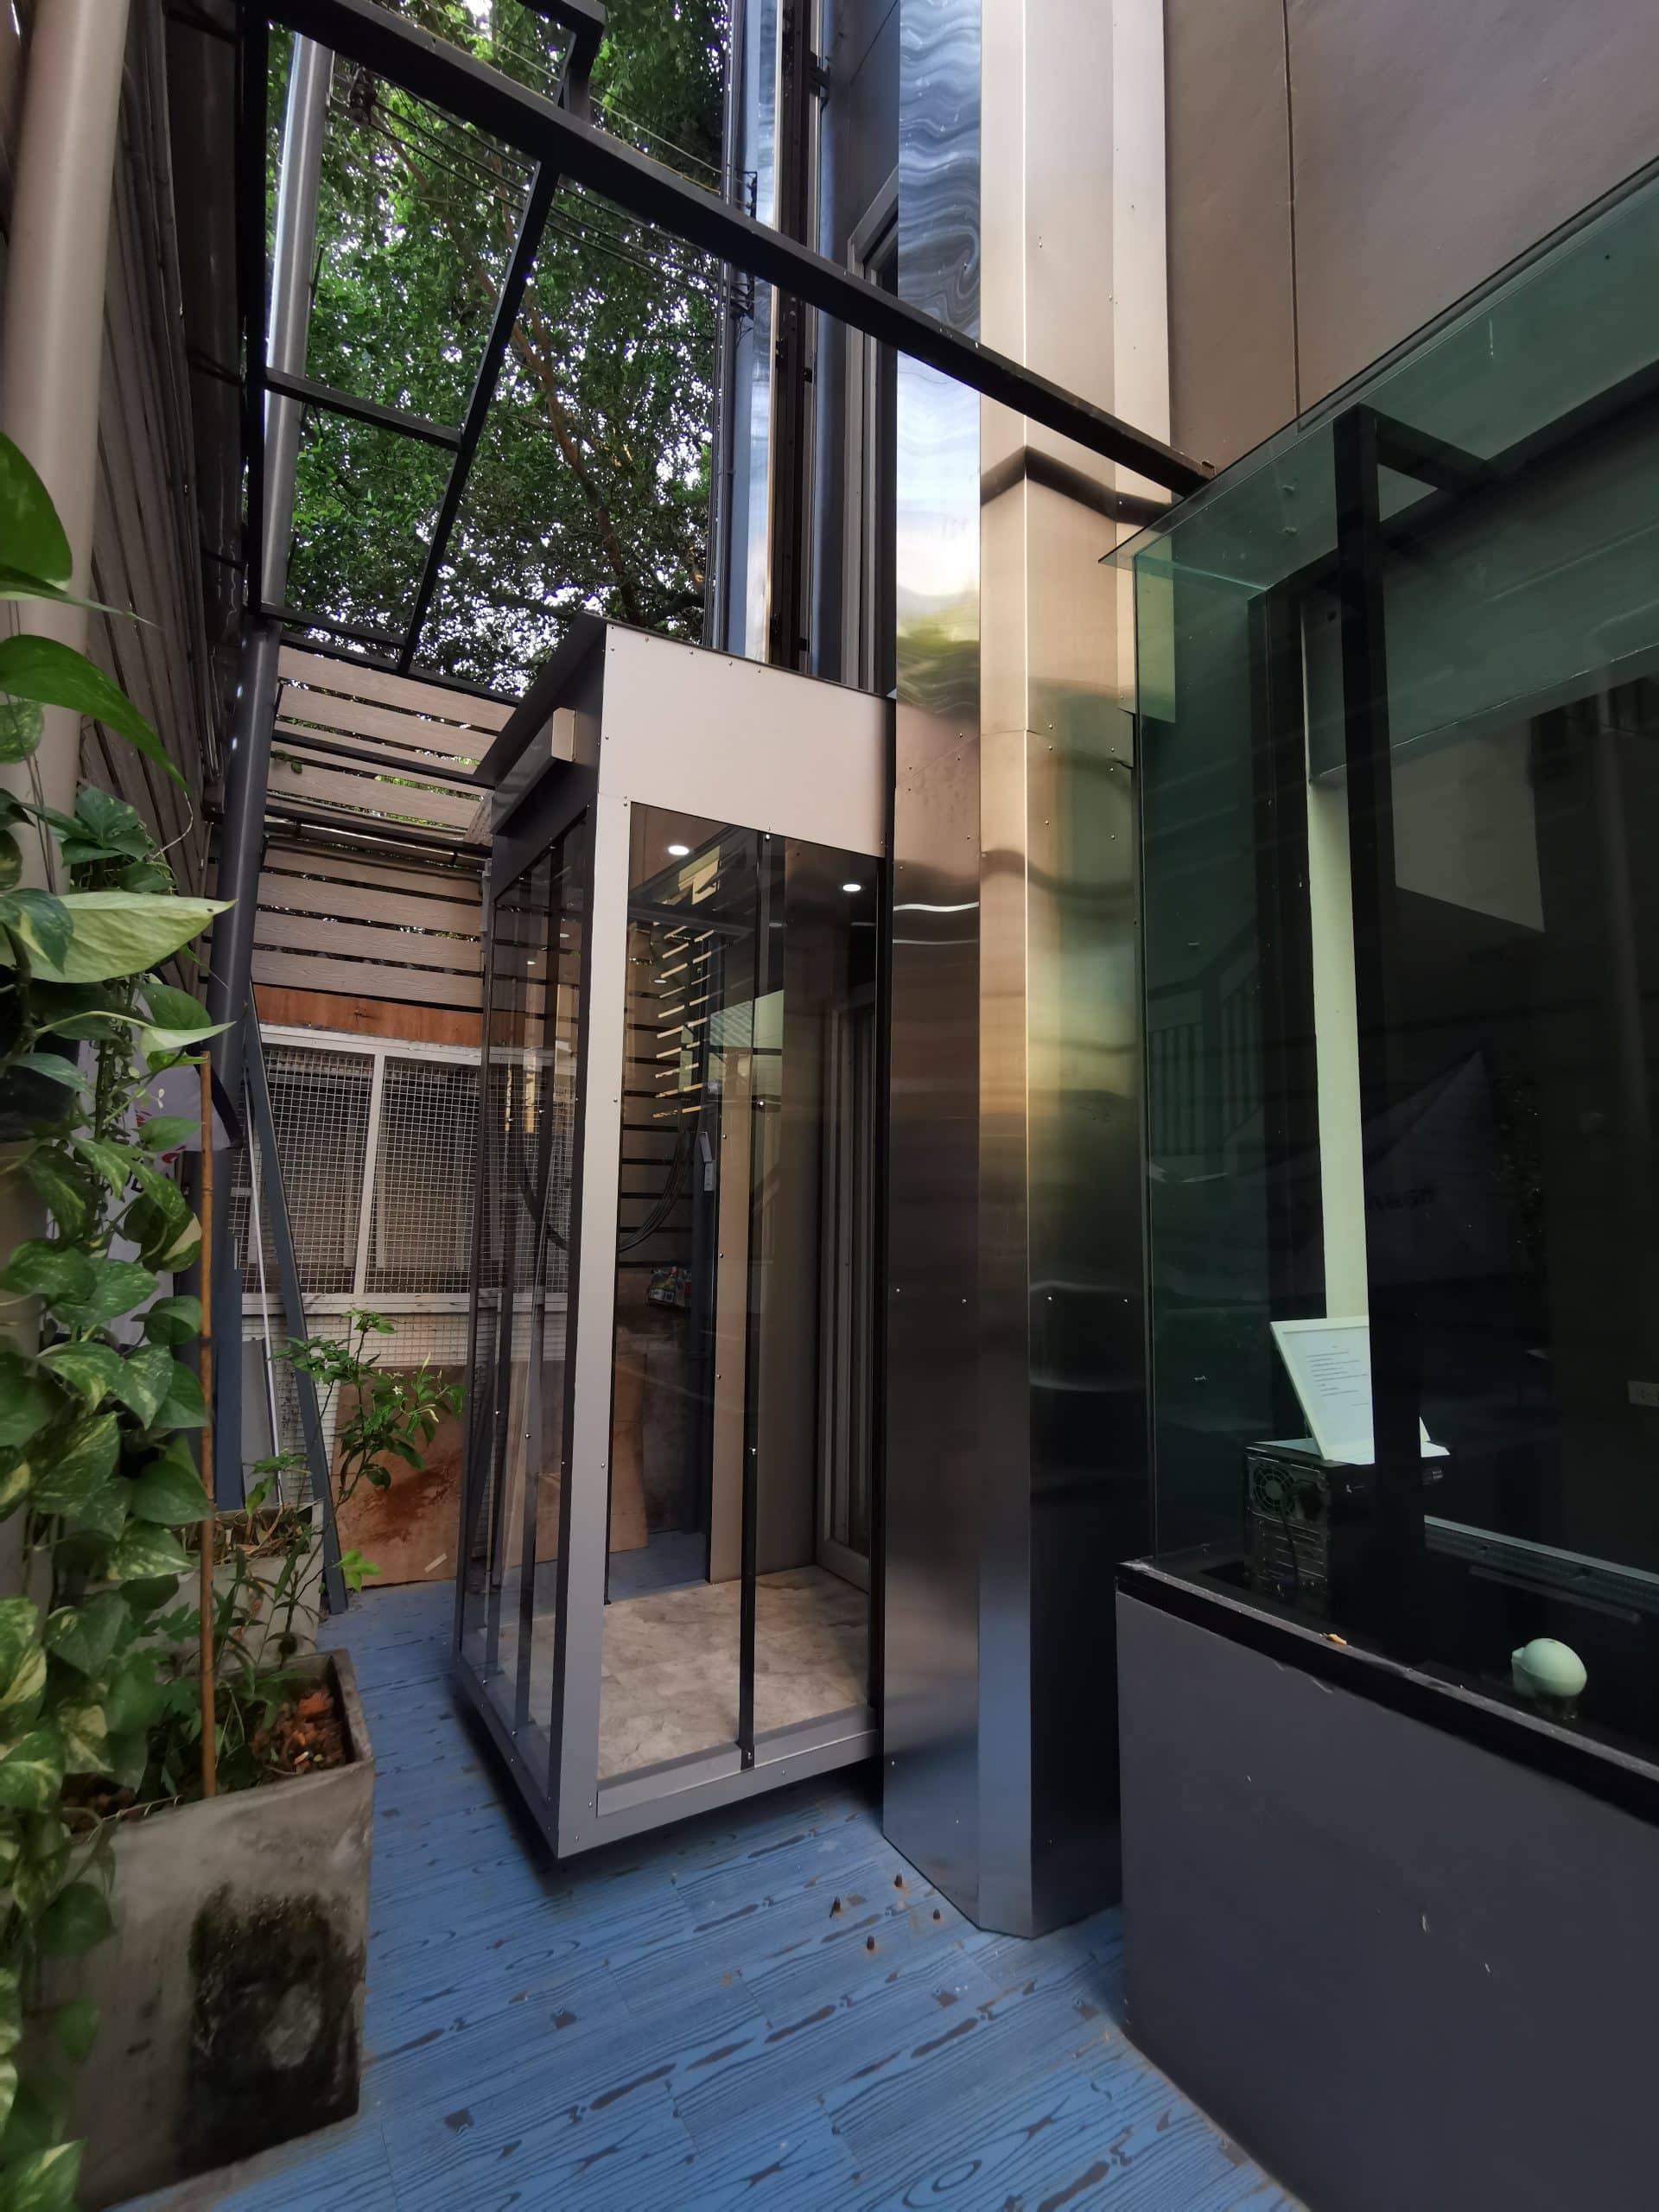 Ximplex touch ลิฟต์บ้าน ลิฟท์บ้าน